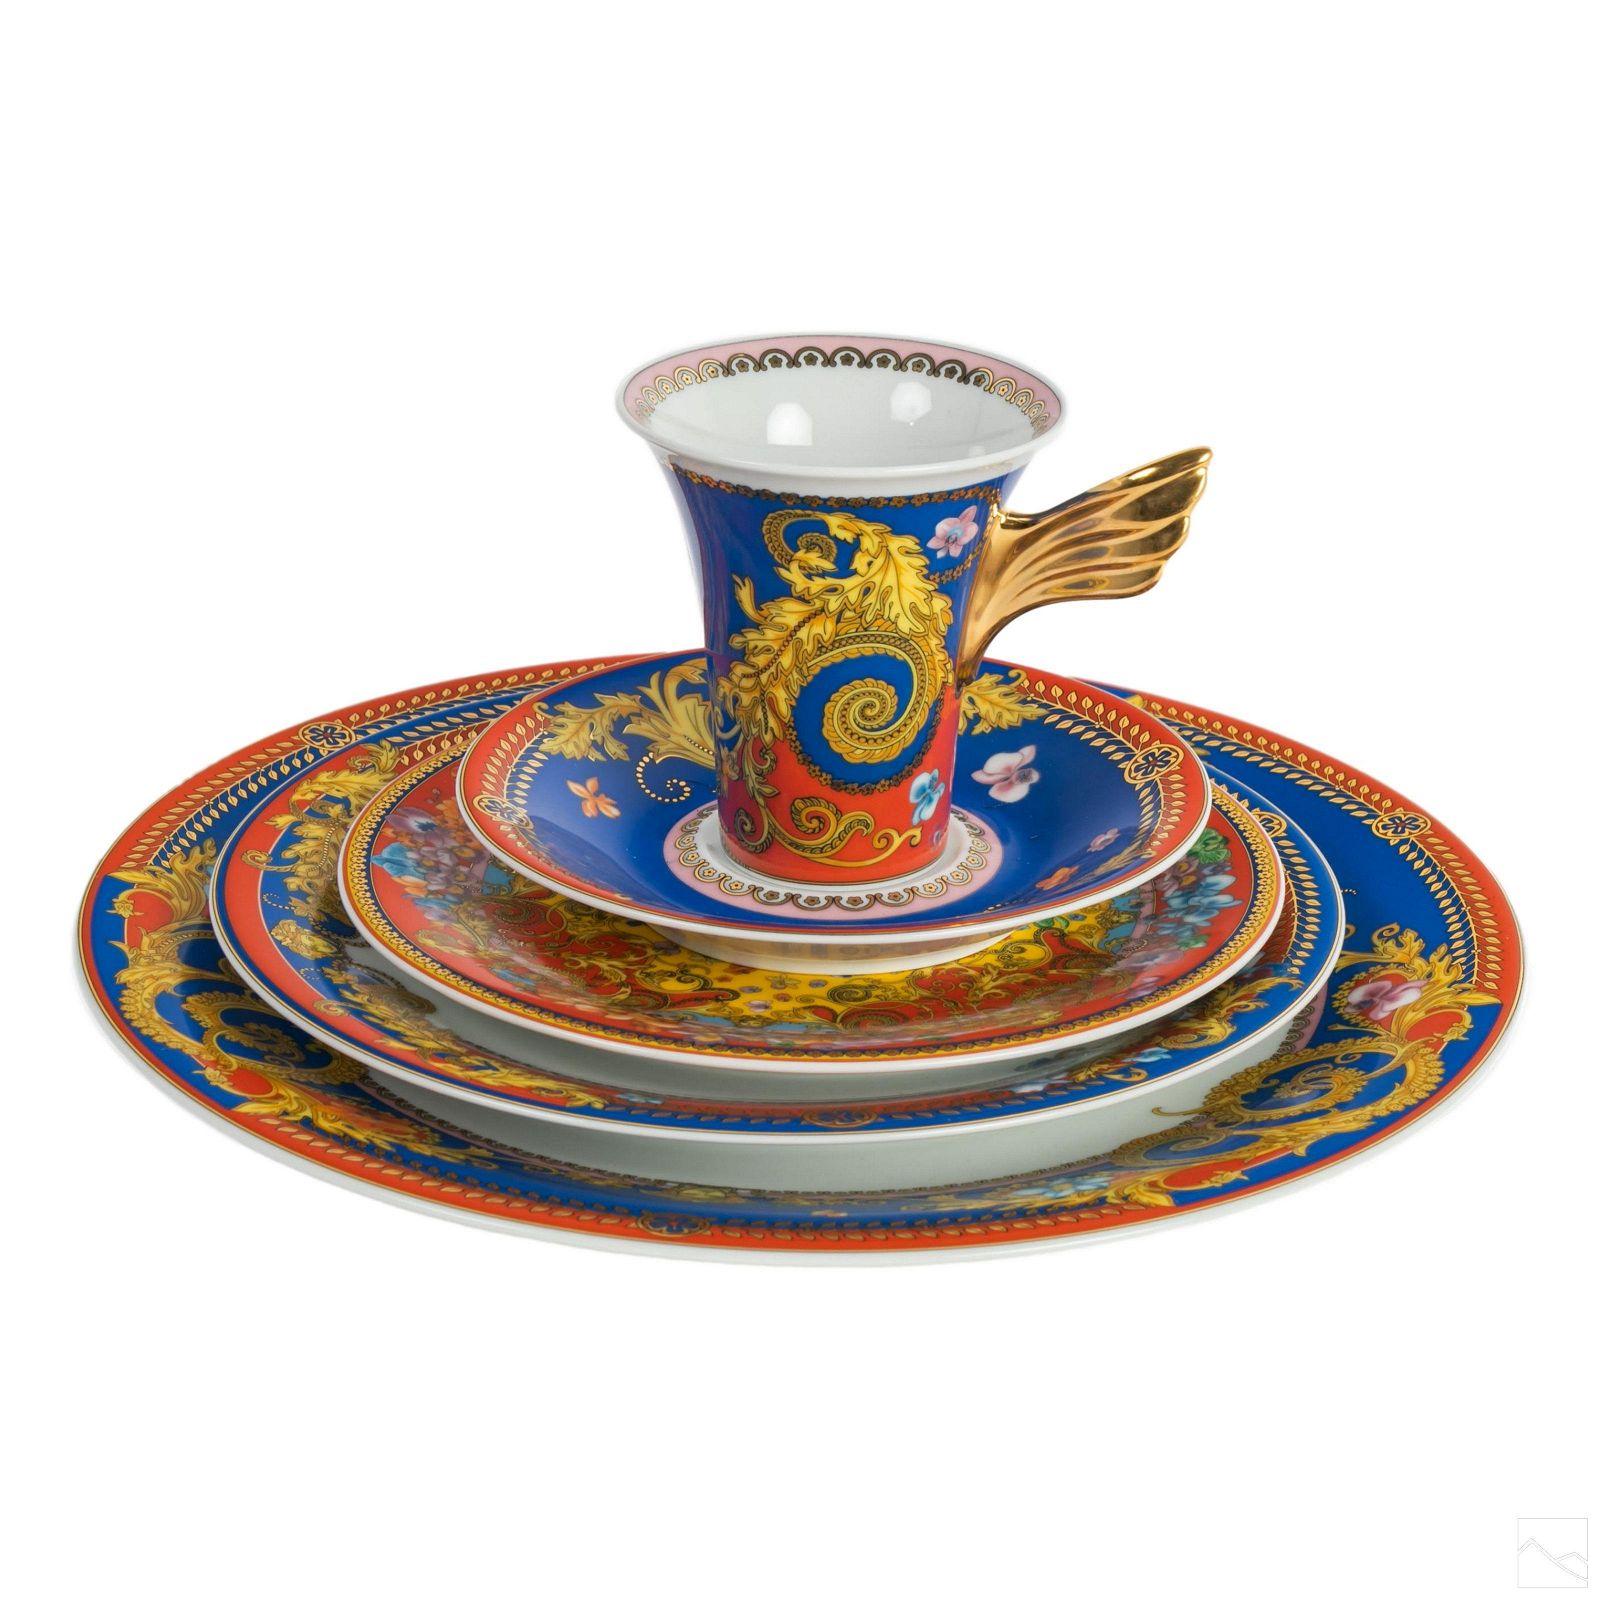 Rosenthal Versace Primavera Porcelain China 5 Pc